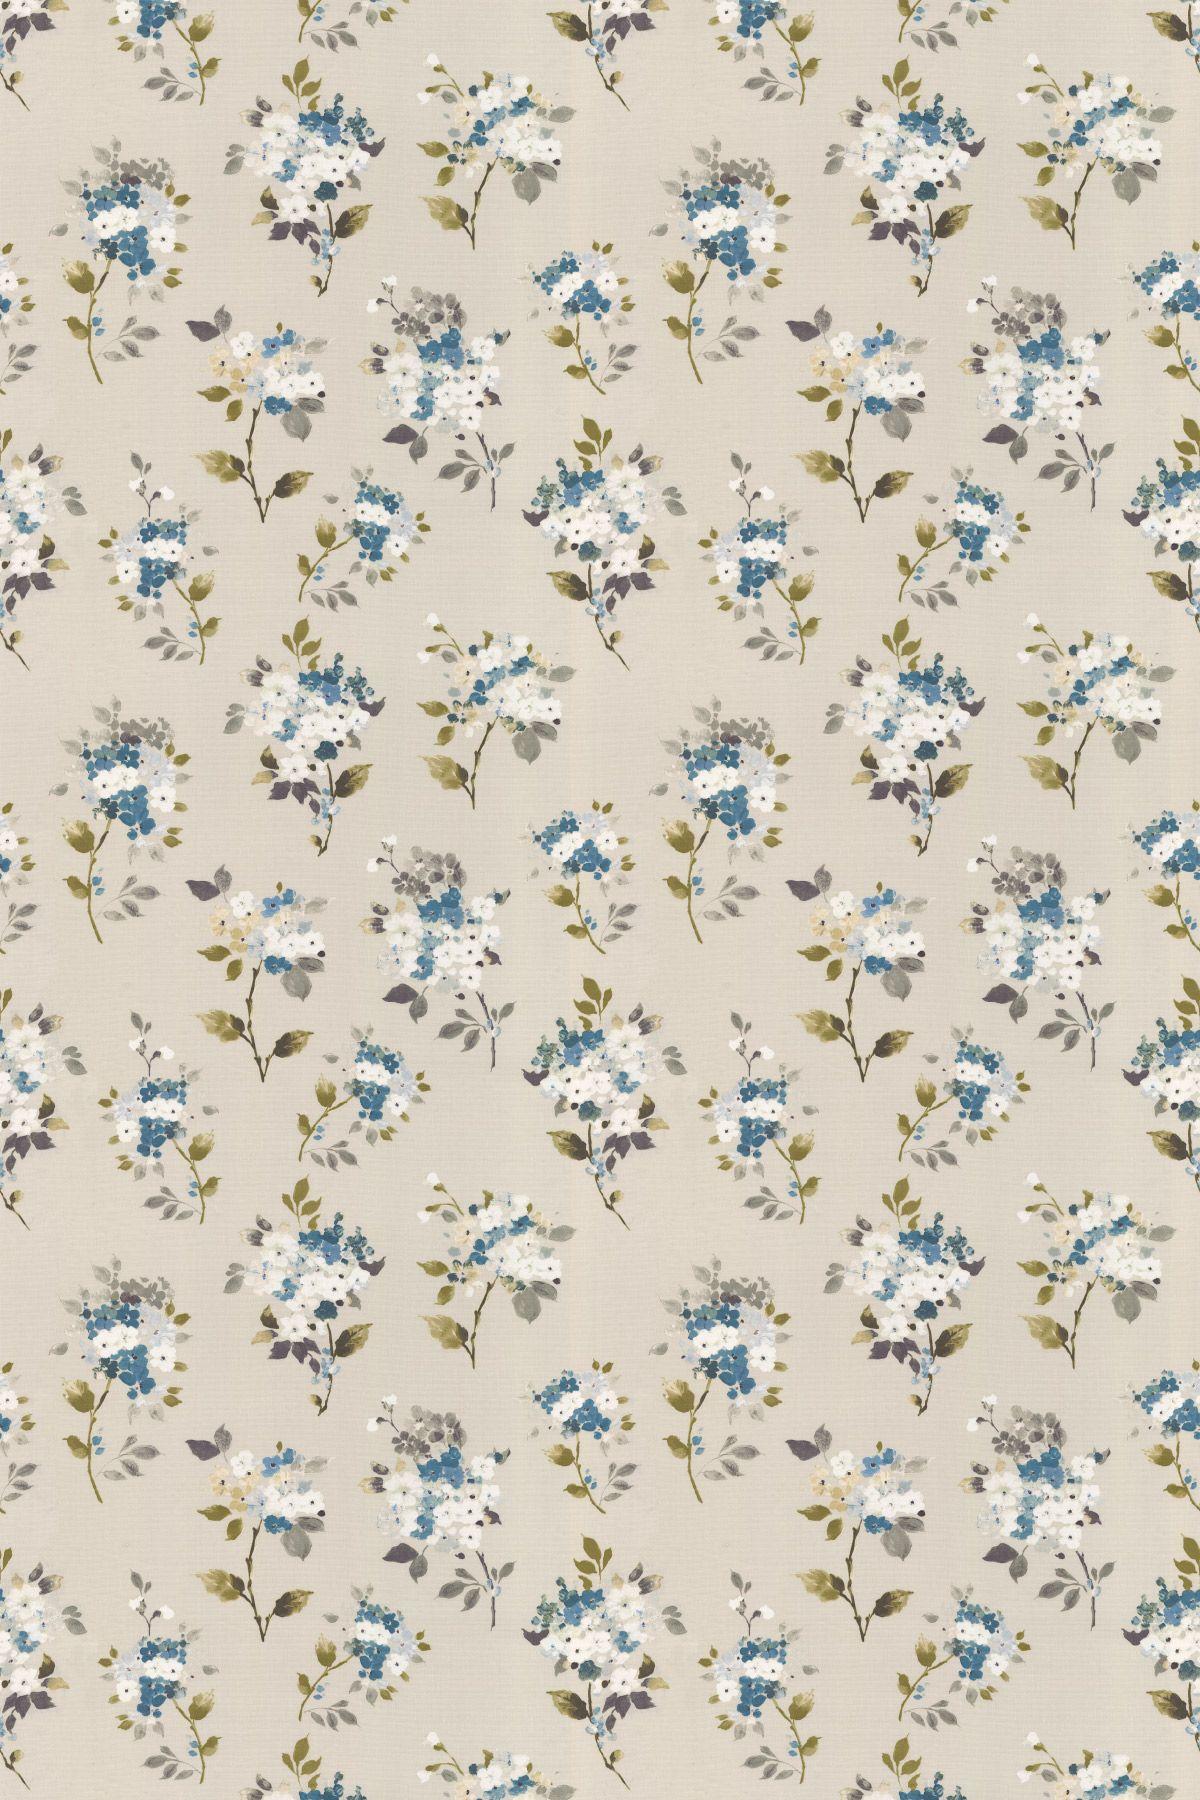 Merewood by Prestigious Bluebell Fabric 5015/768 벽지